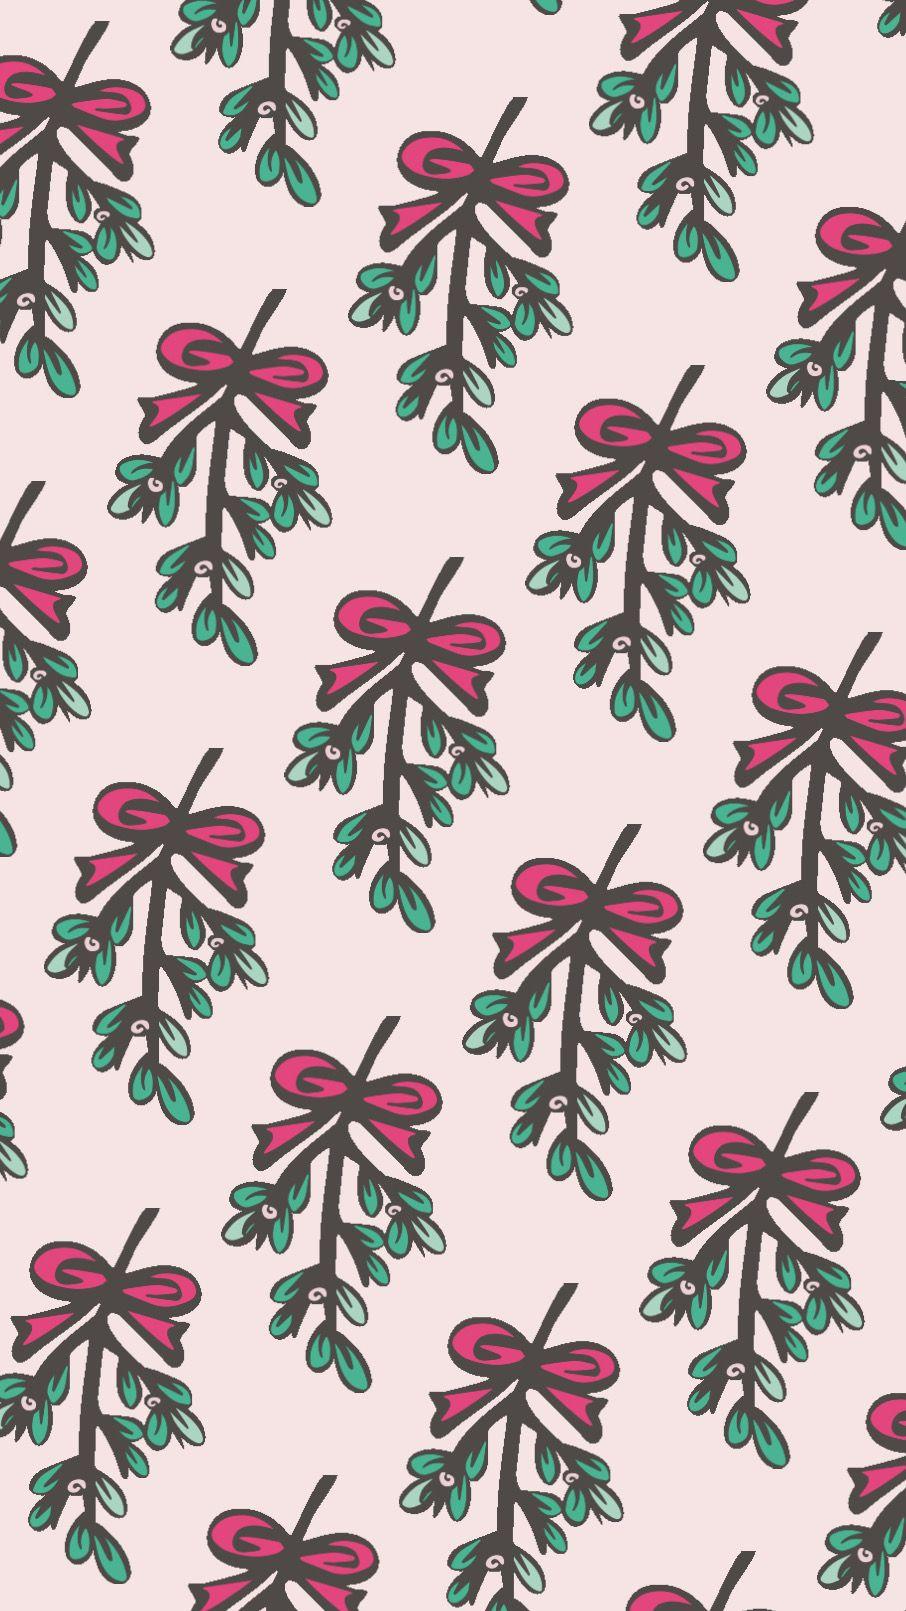 ᴮᵞᵛᴵ ᵞᴼᵁ Wallpaper Christmas Wallpaper